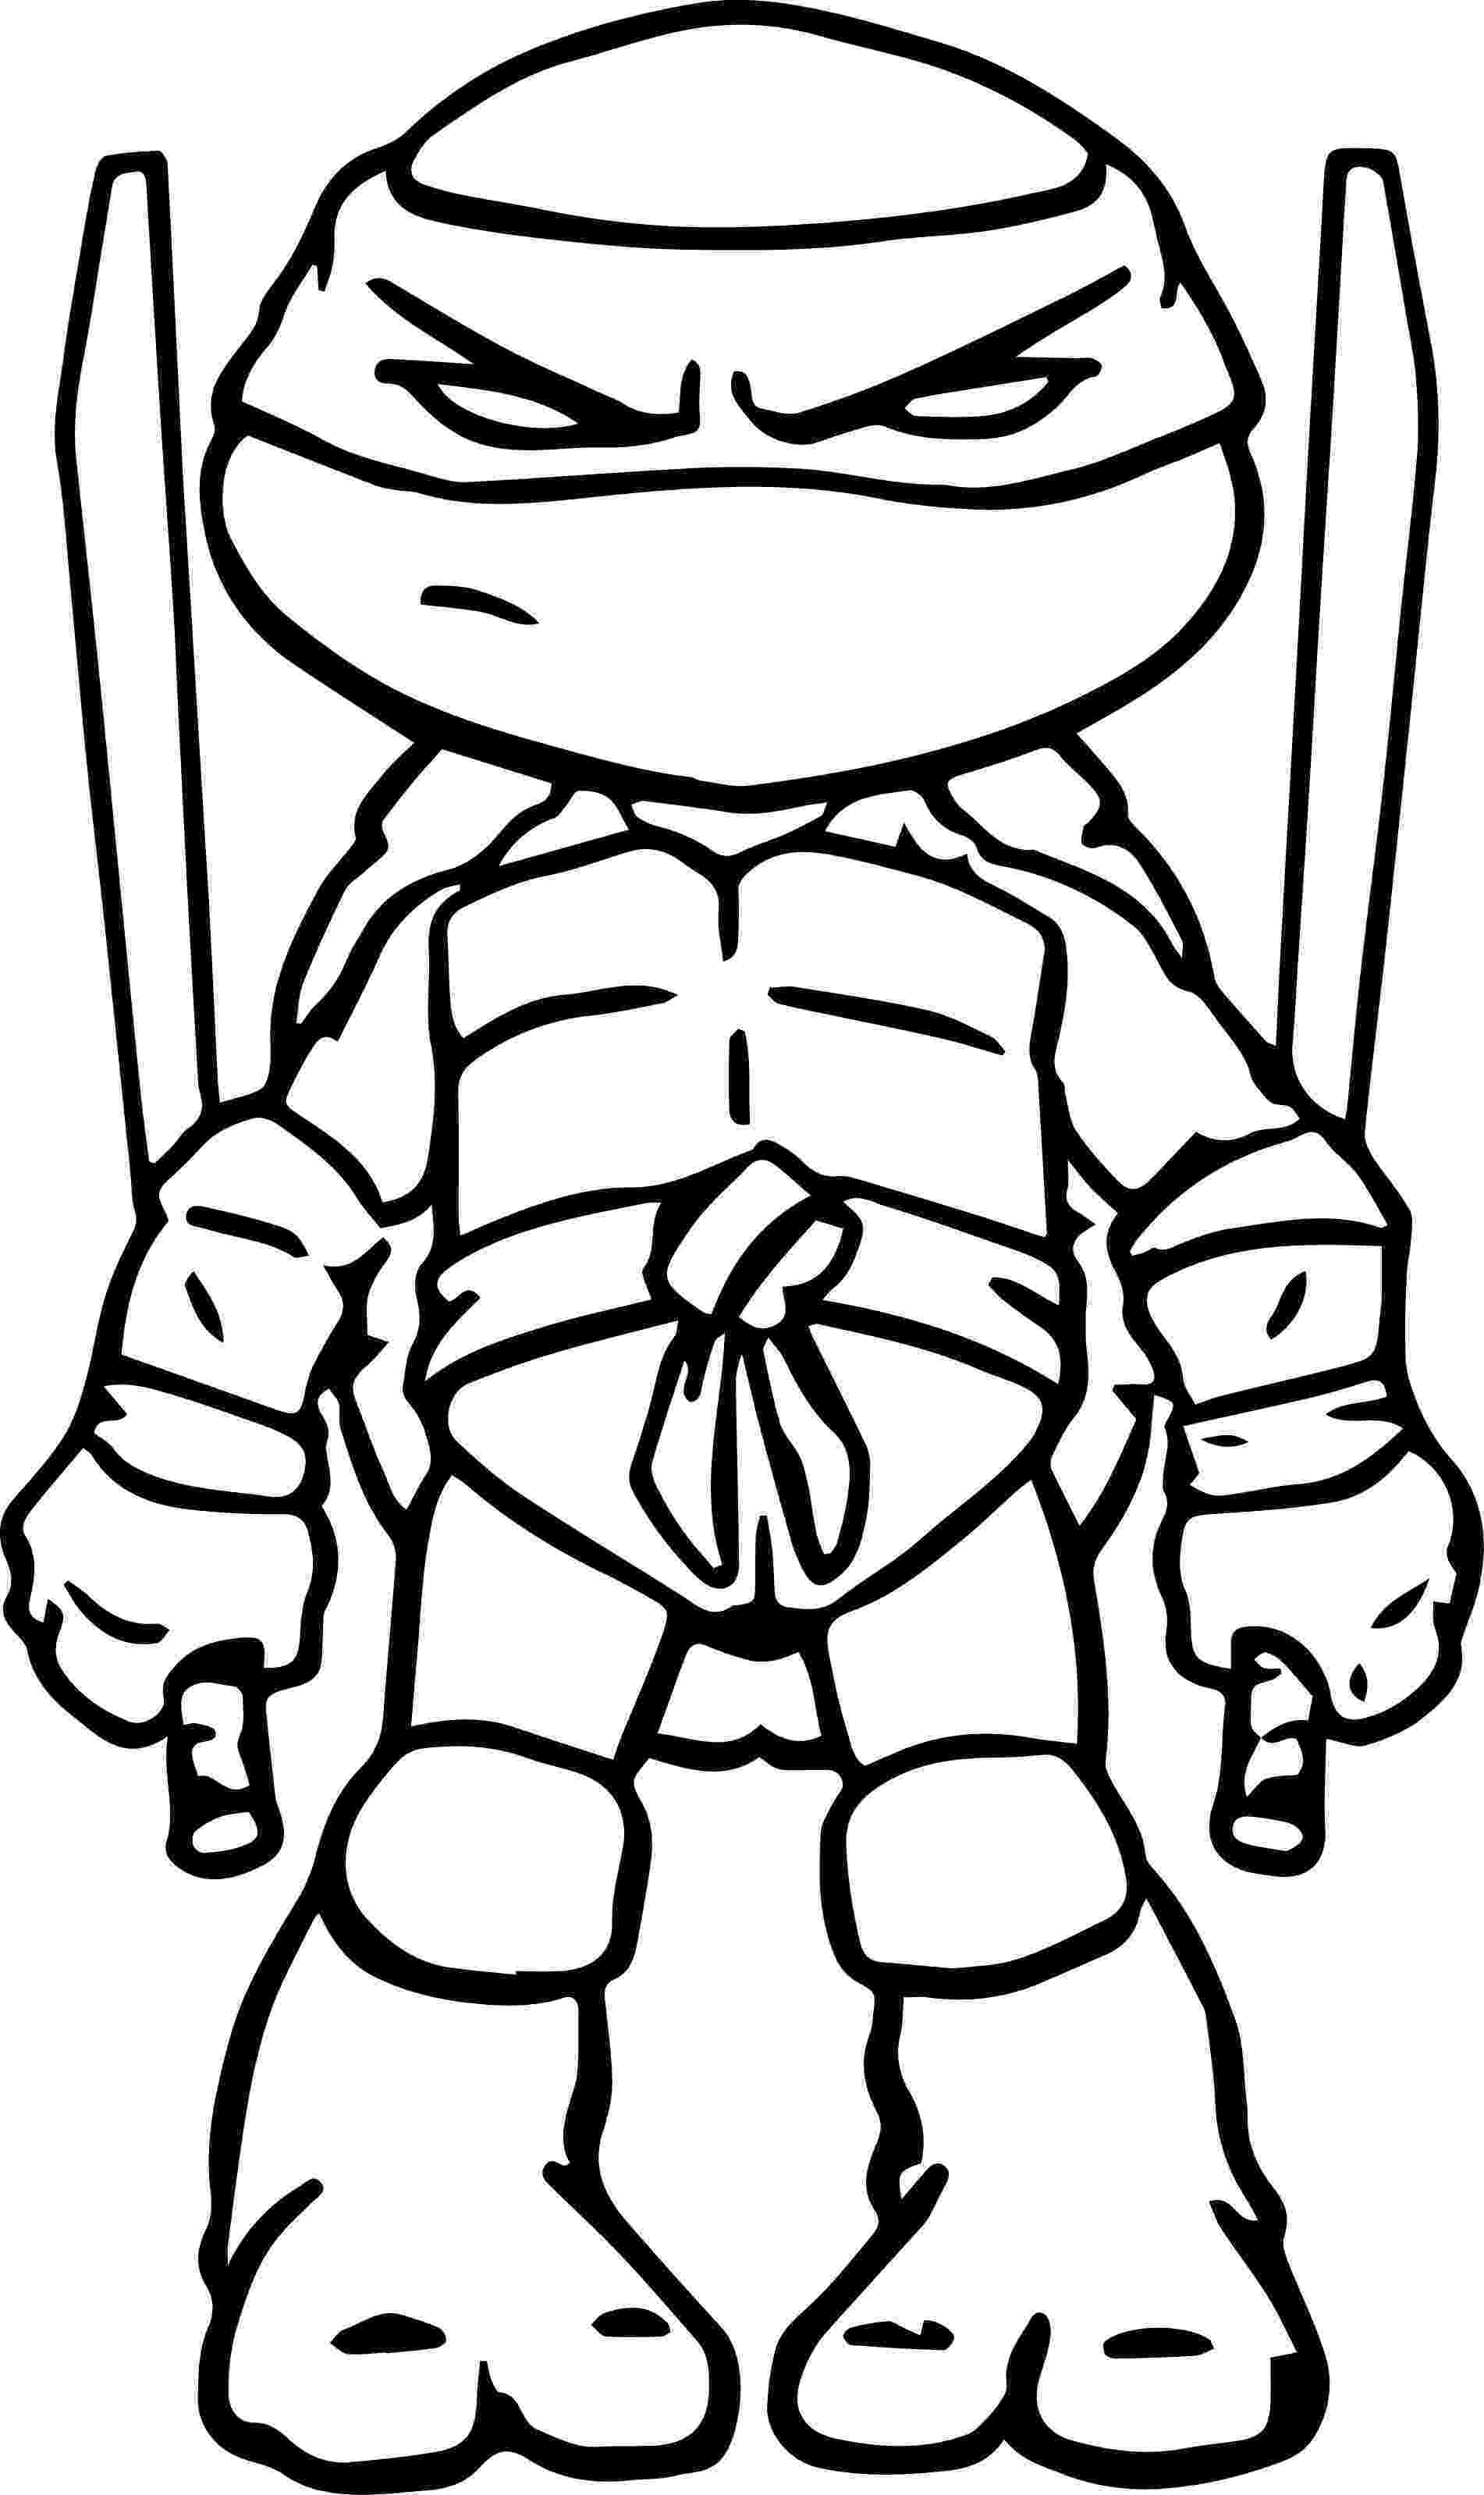 ninja turtle coloring pages teenage mutant ninja turtles coloring pages print them turtle pages coloring ninja